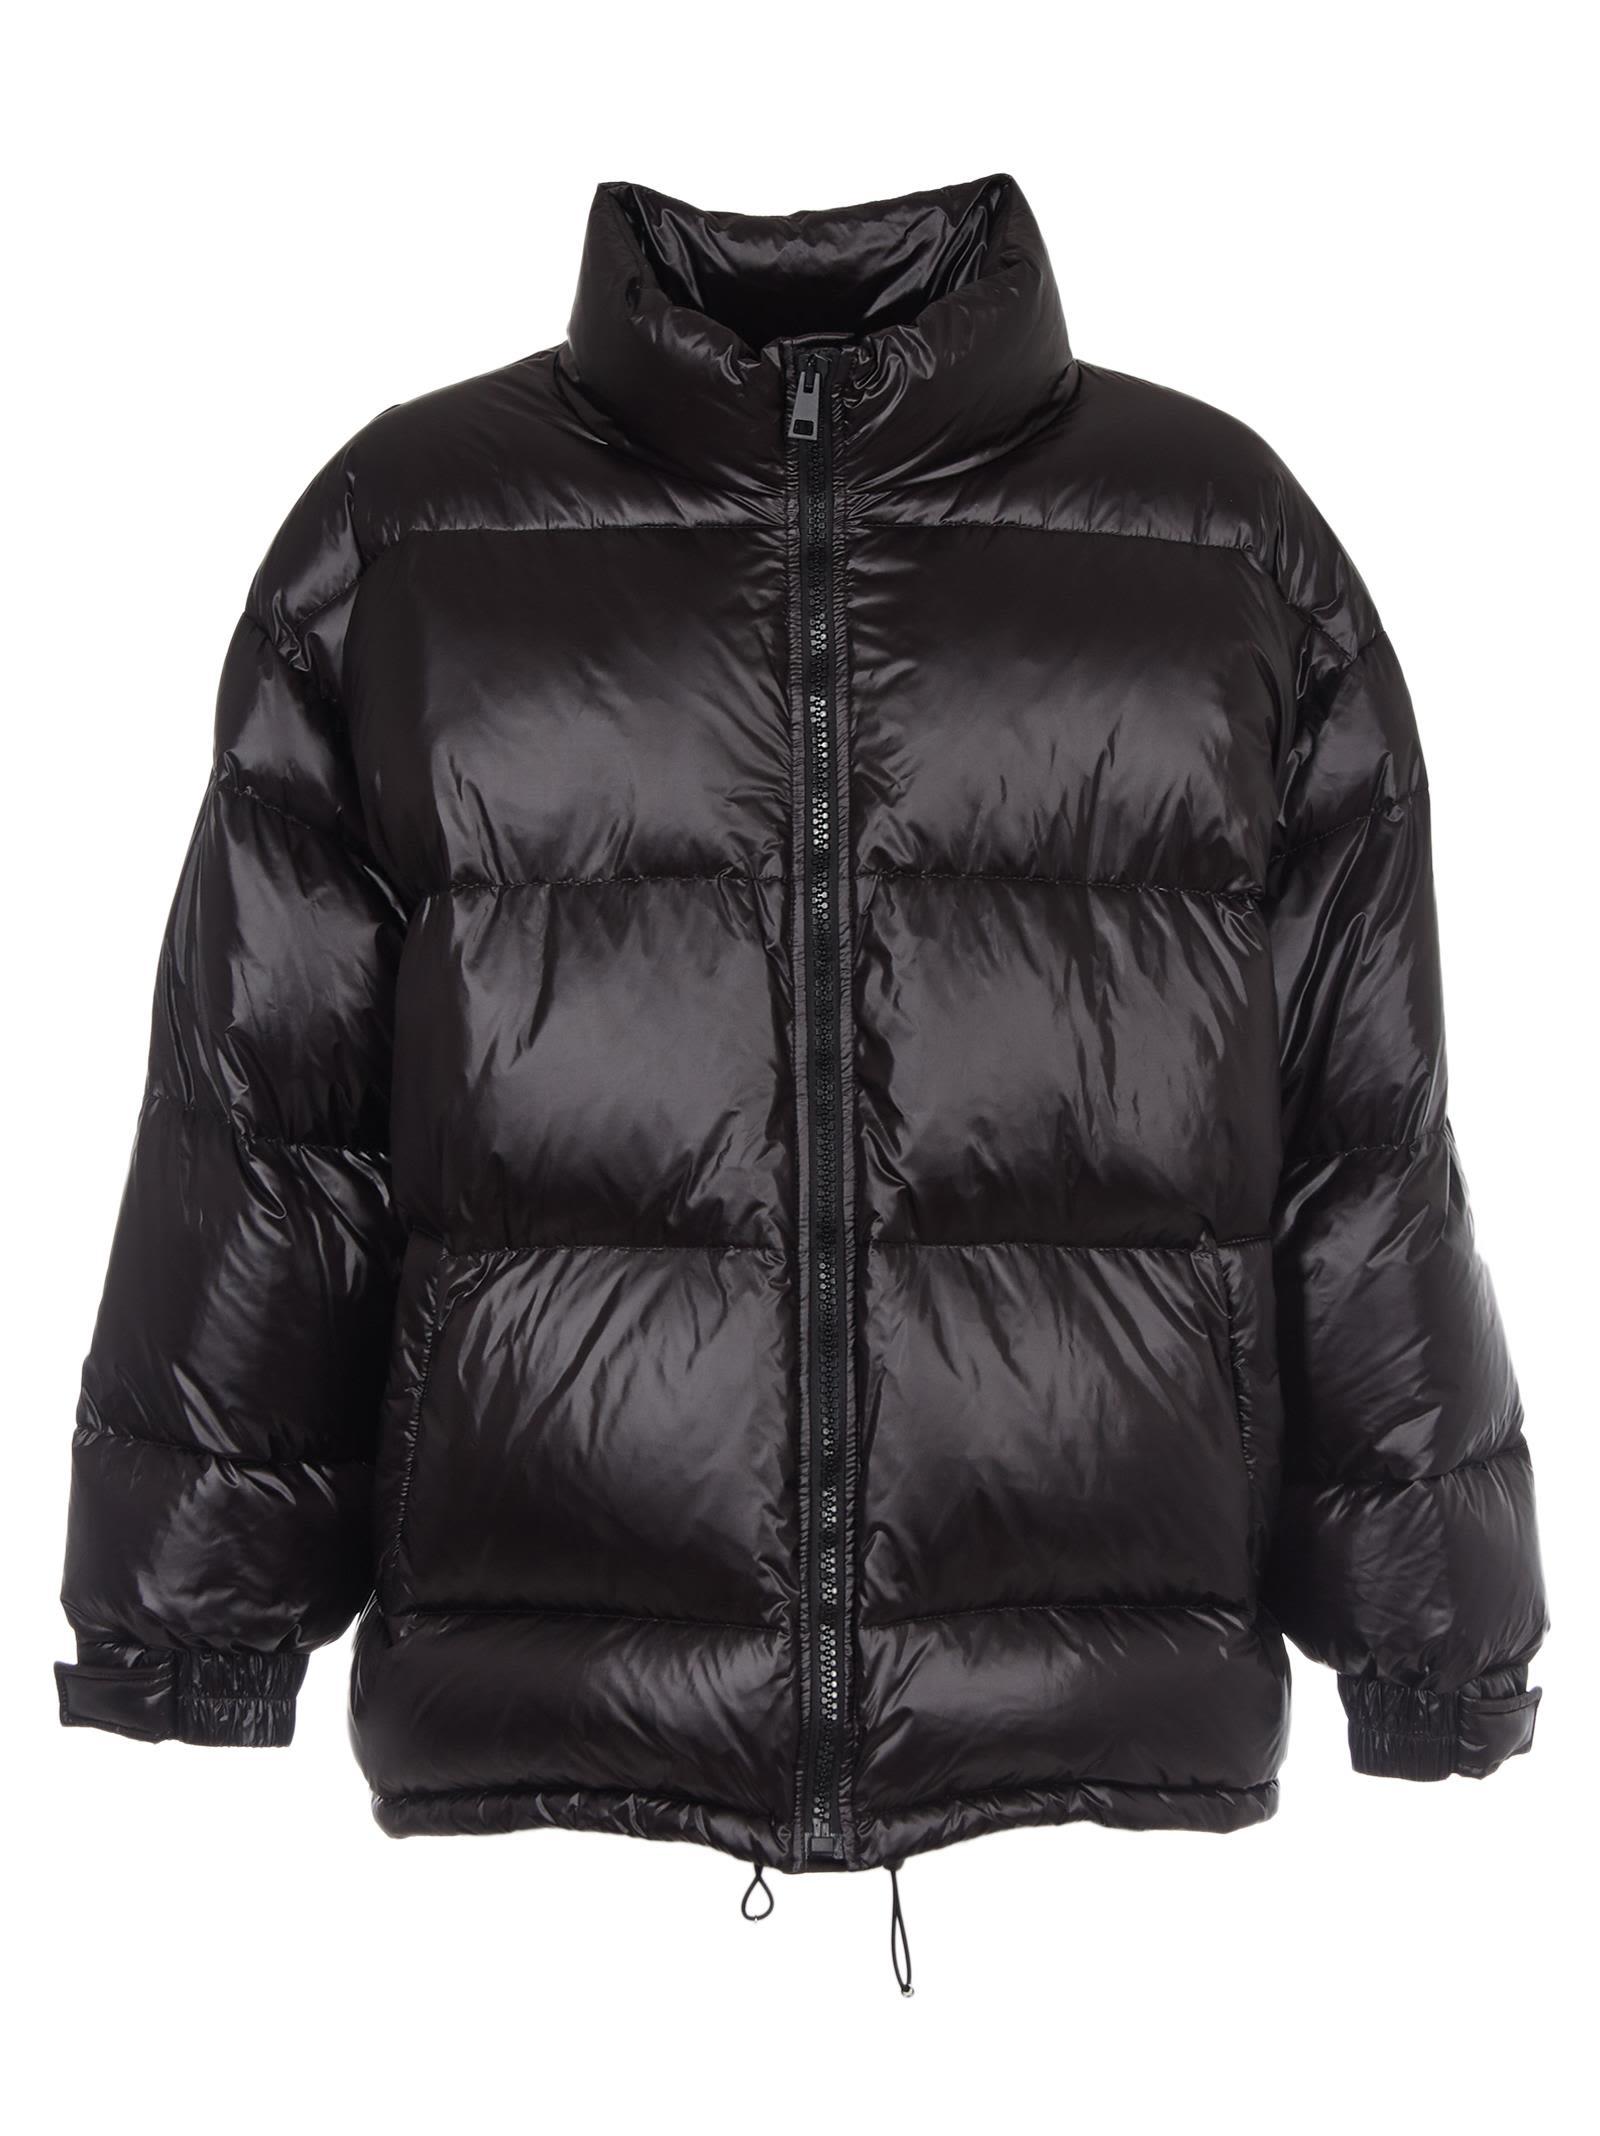 DANILO PAURA Mosca Padded Jacket in Black